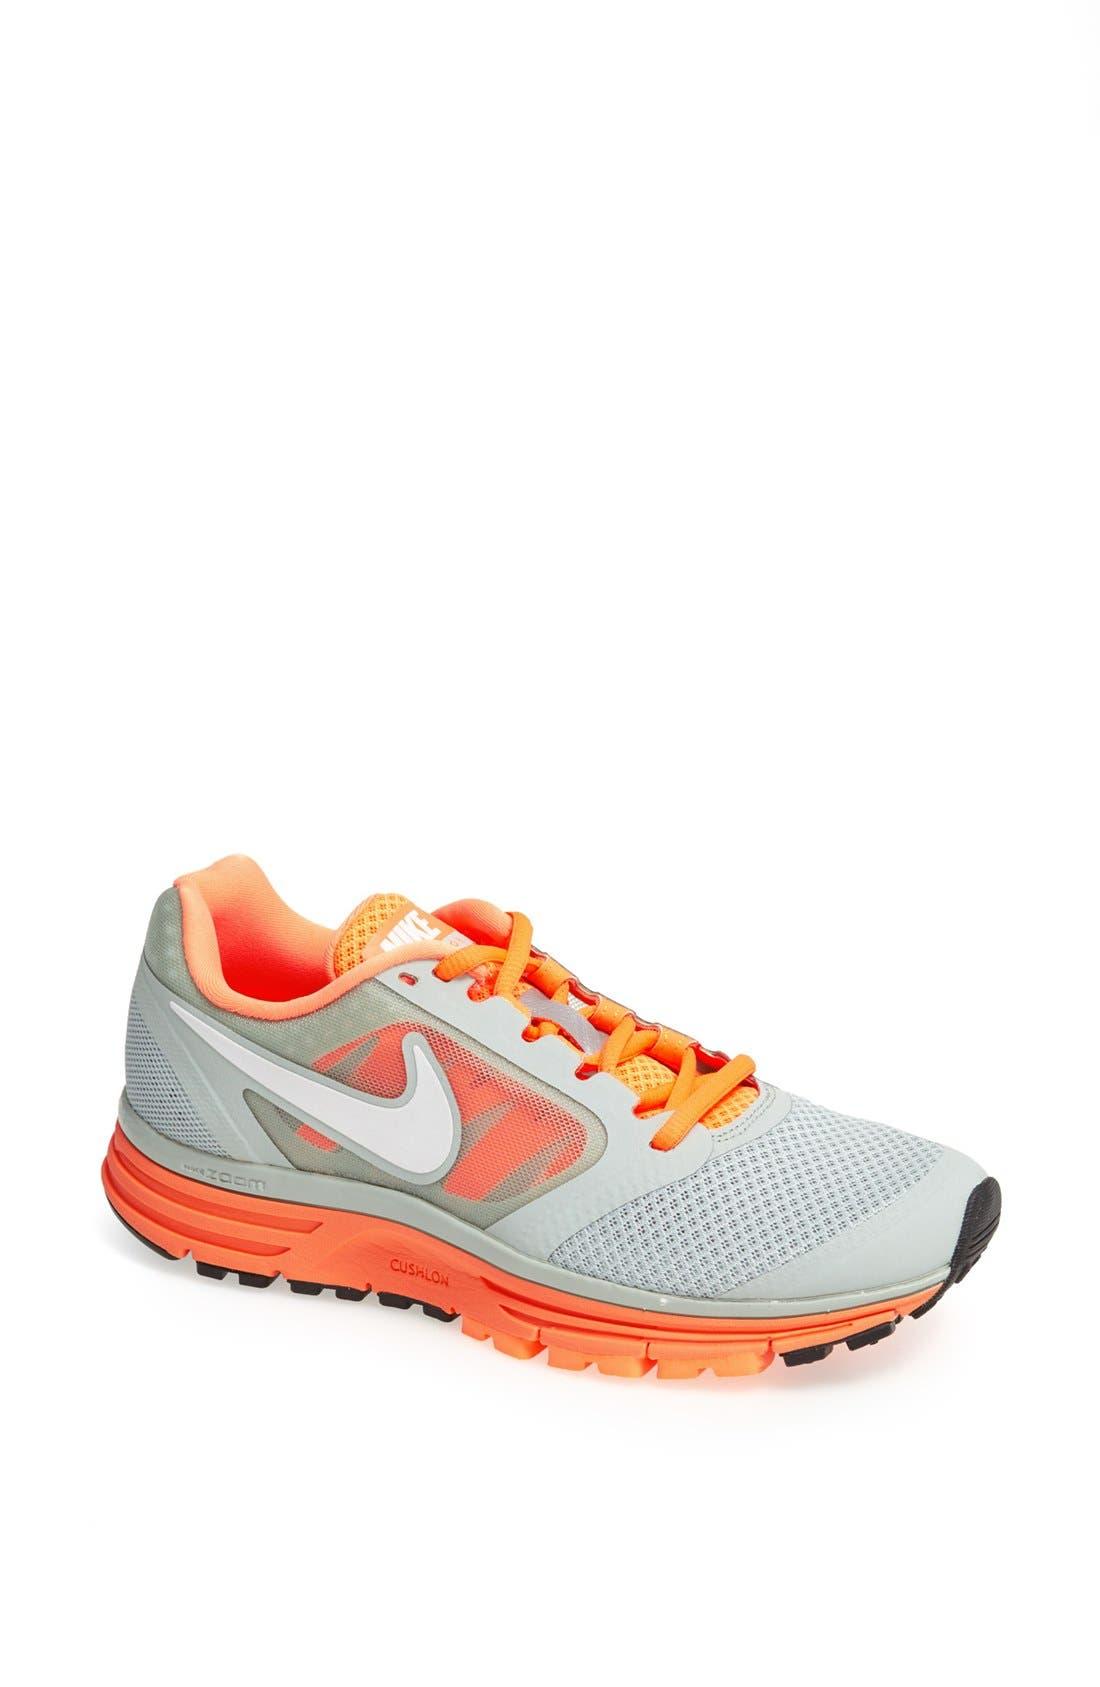 Alternate Image 1 Selected - Nike 'Zoom Vomero+ 8' Running Shoe (Women)